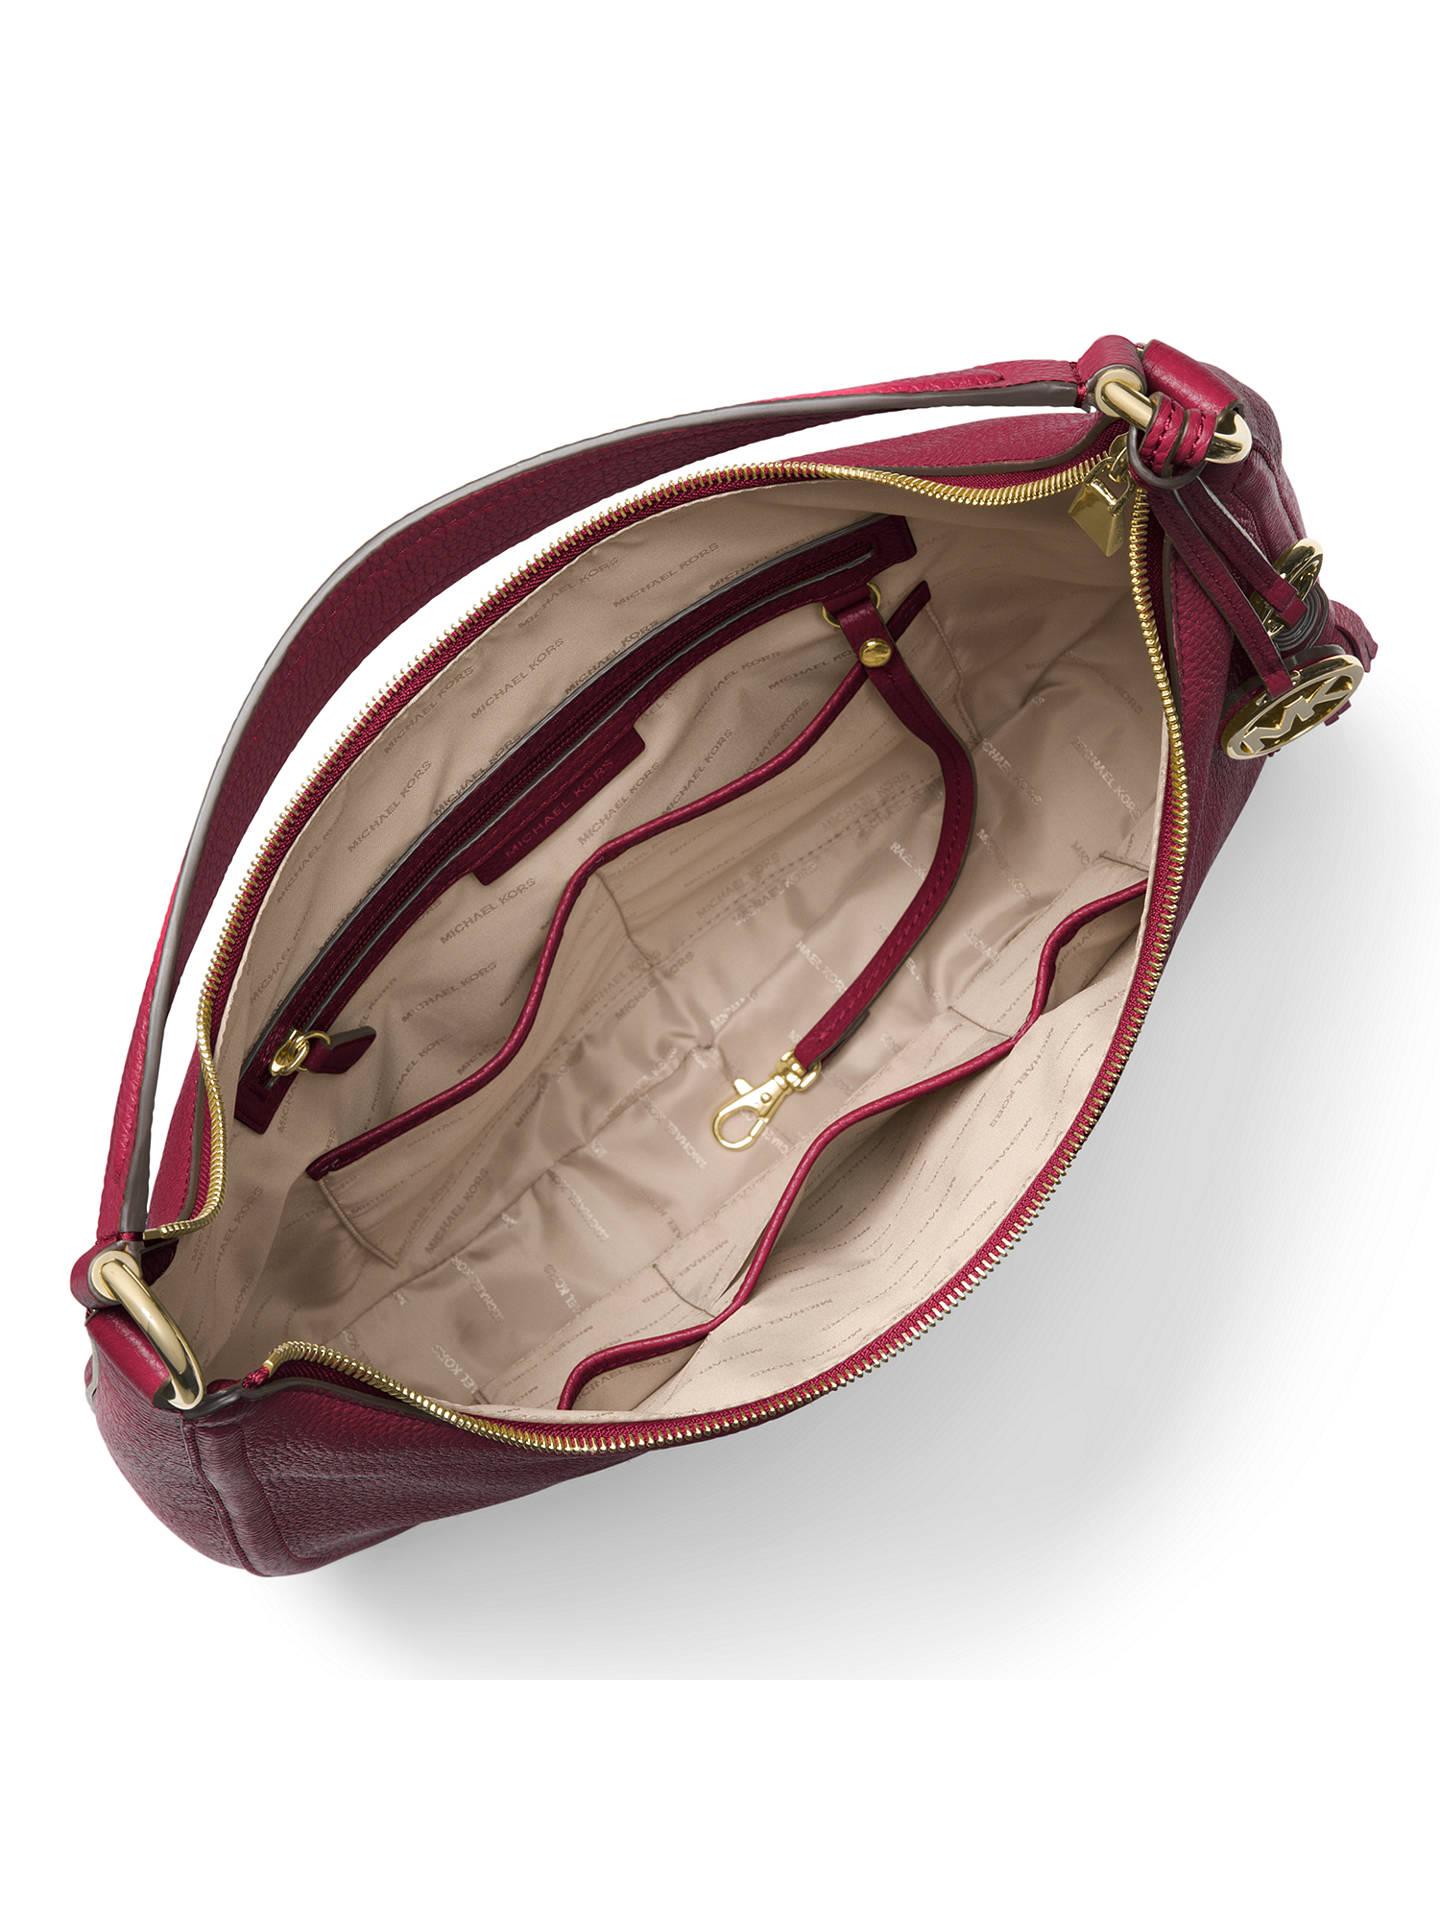 3faf872213 ... Buy MICHAEL Michael Kors Lydia Large Hobo Bag